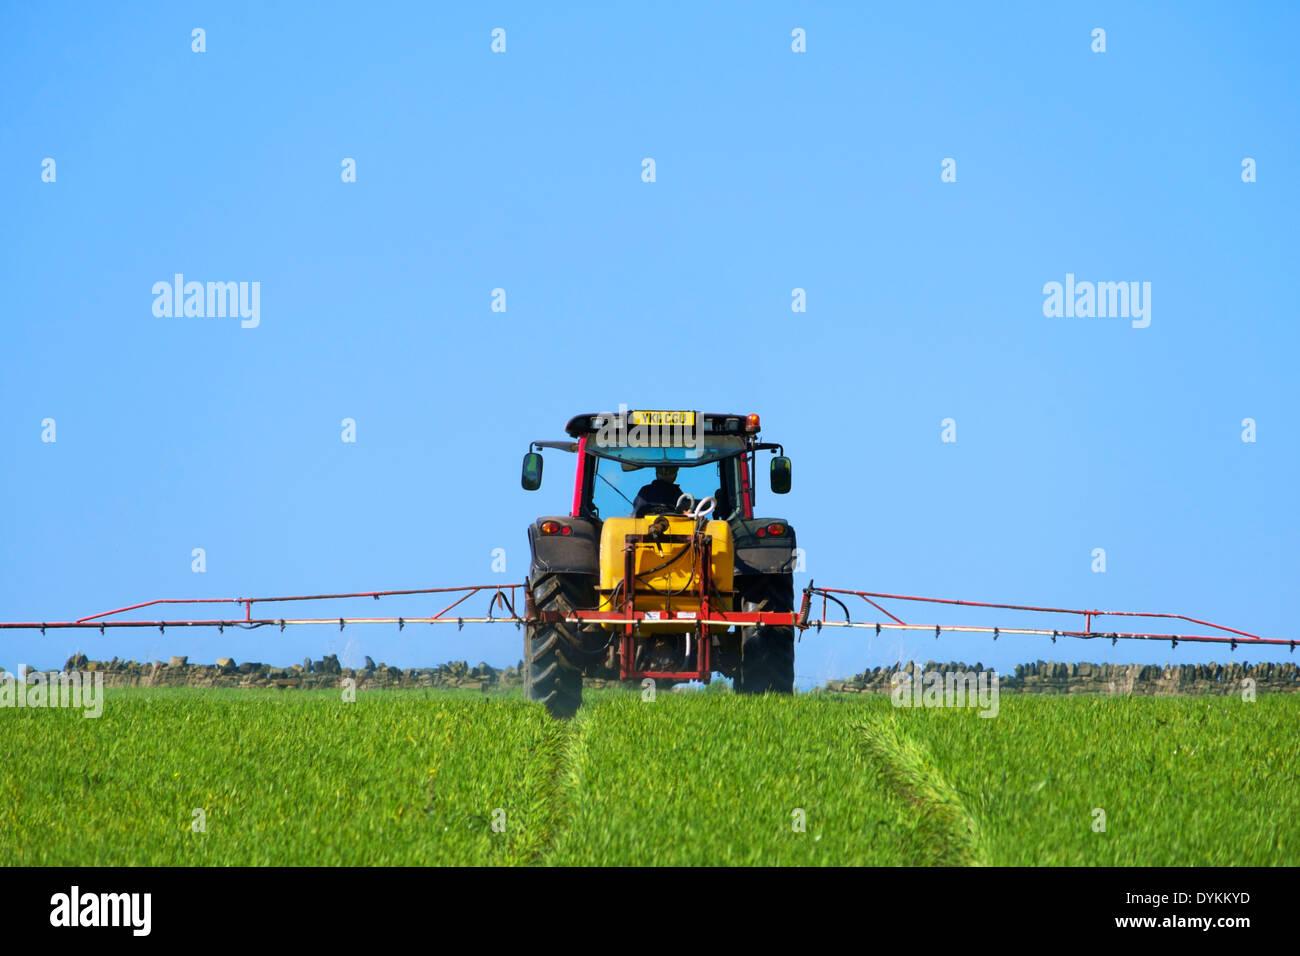 Farmer spraying crops near Thurstonland, Holme Valley, West Yorkshire, England, UK - Stock Image